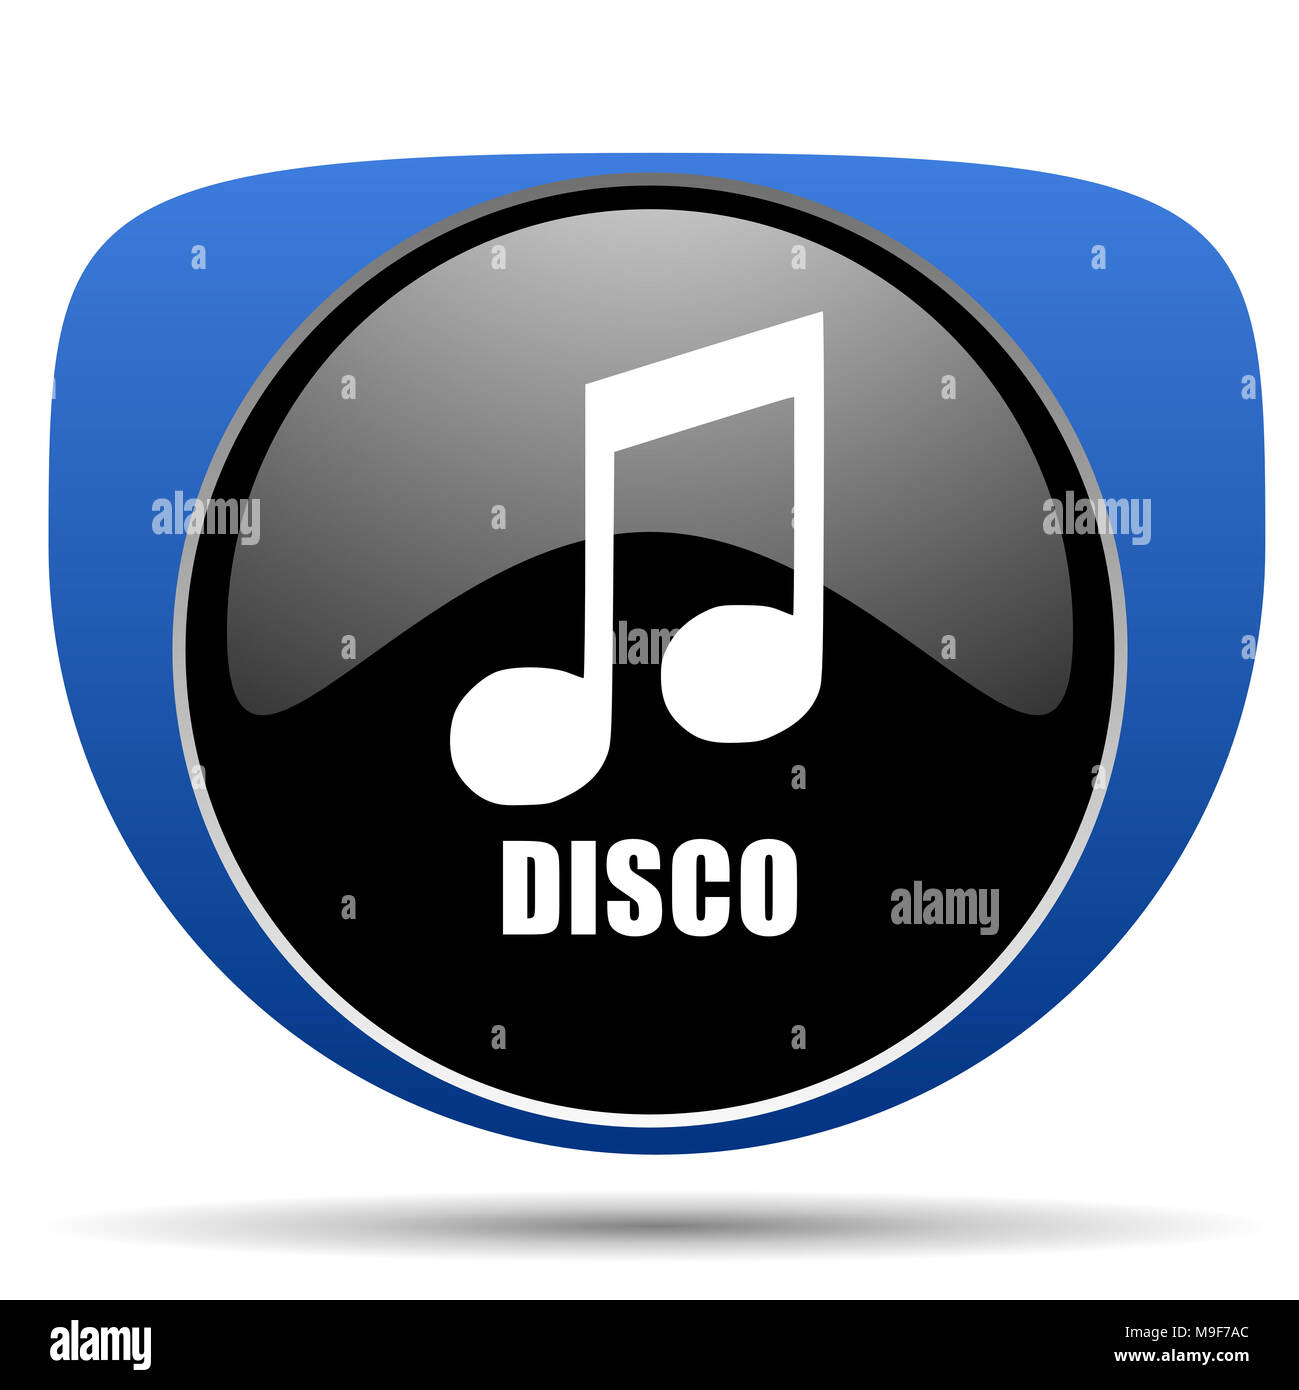 Disco music web icon - Stock Image